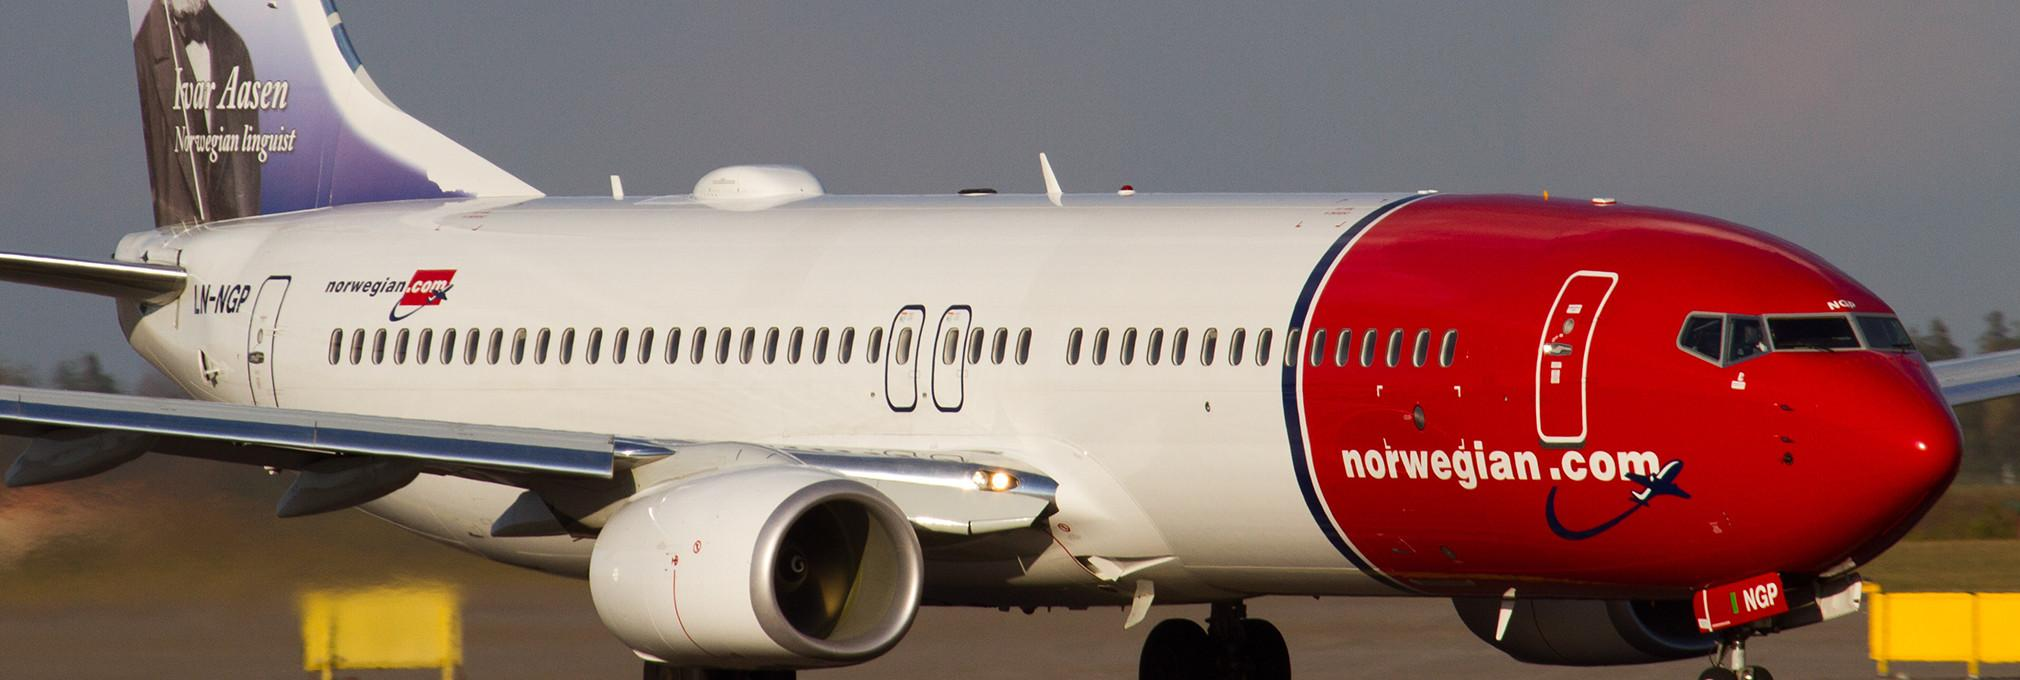 norwegian flygresor se